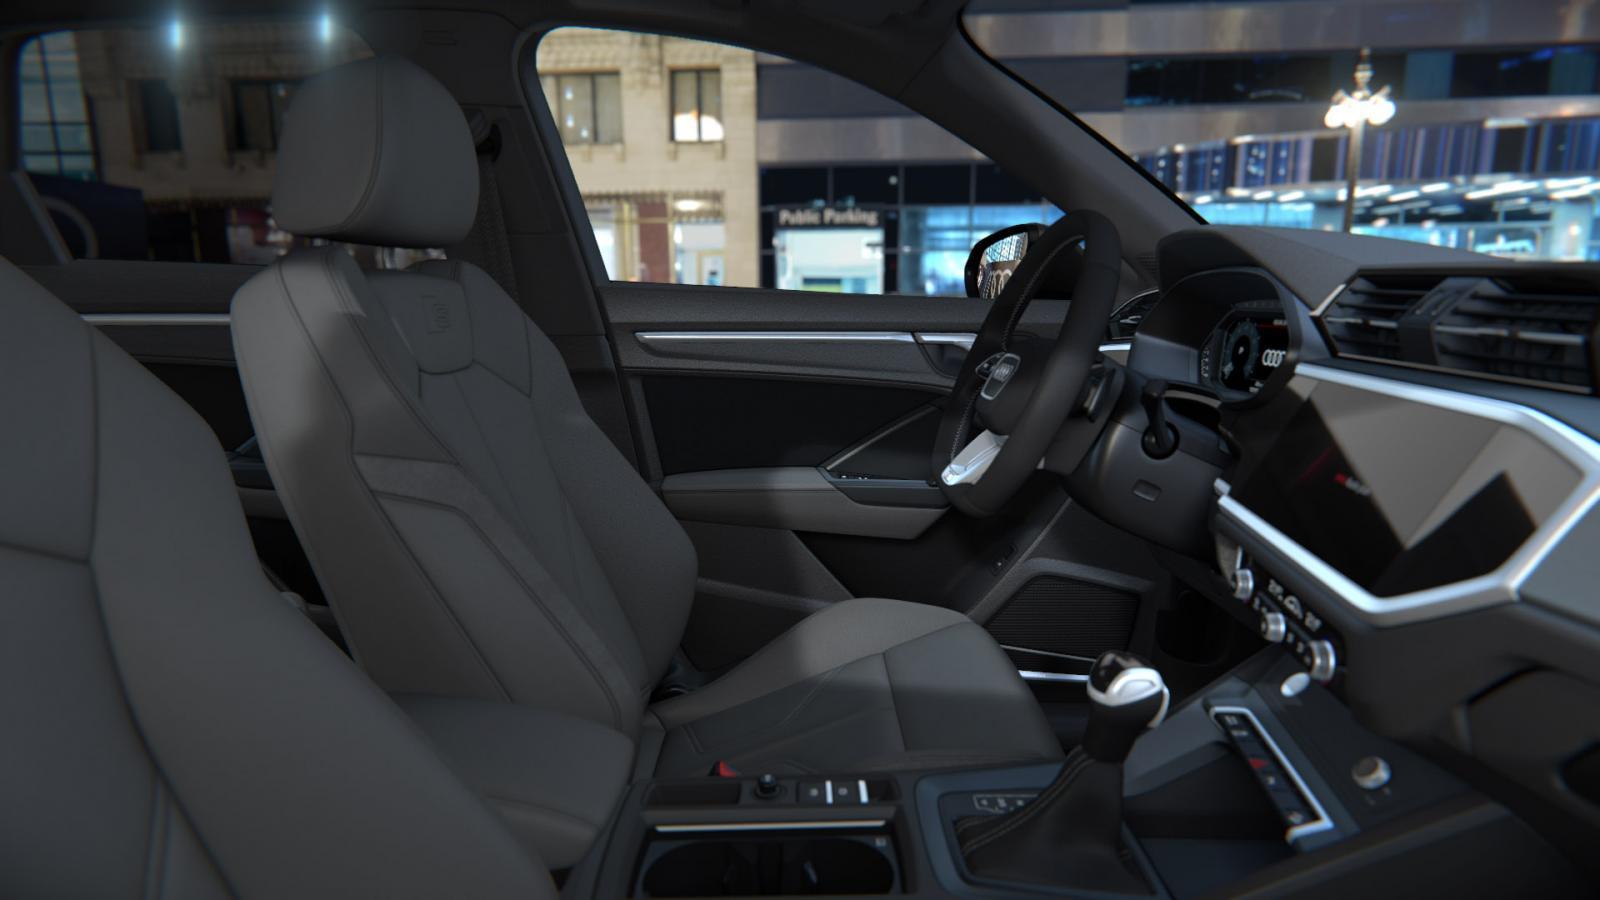 La Audi Q3 es muy tecnológica